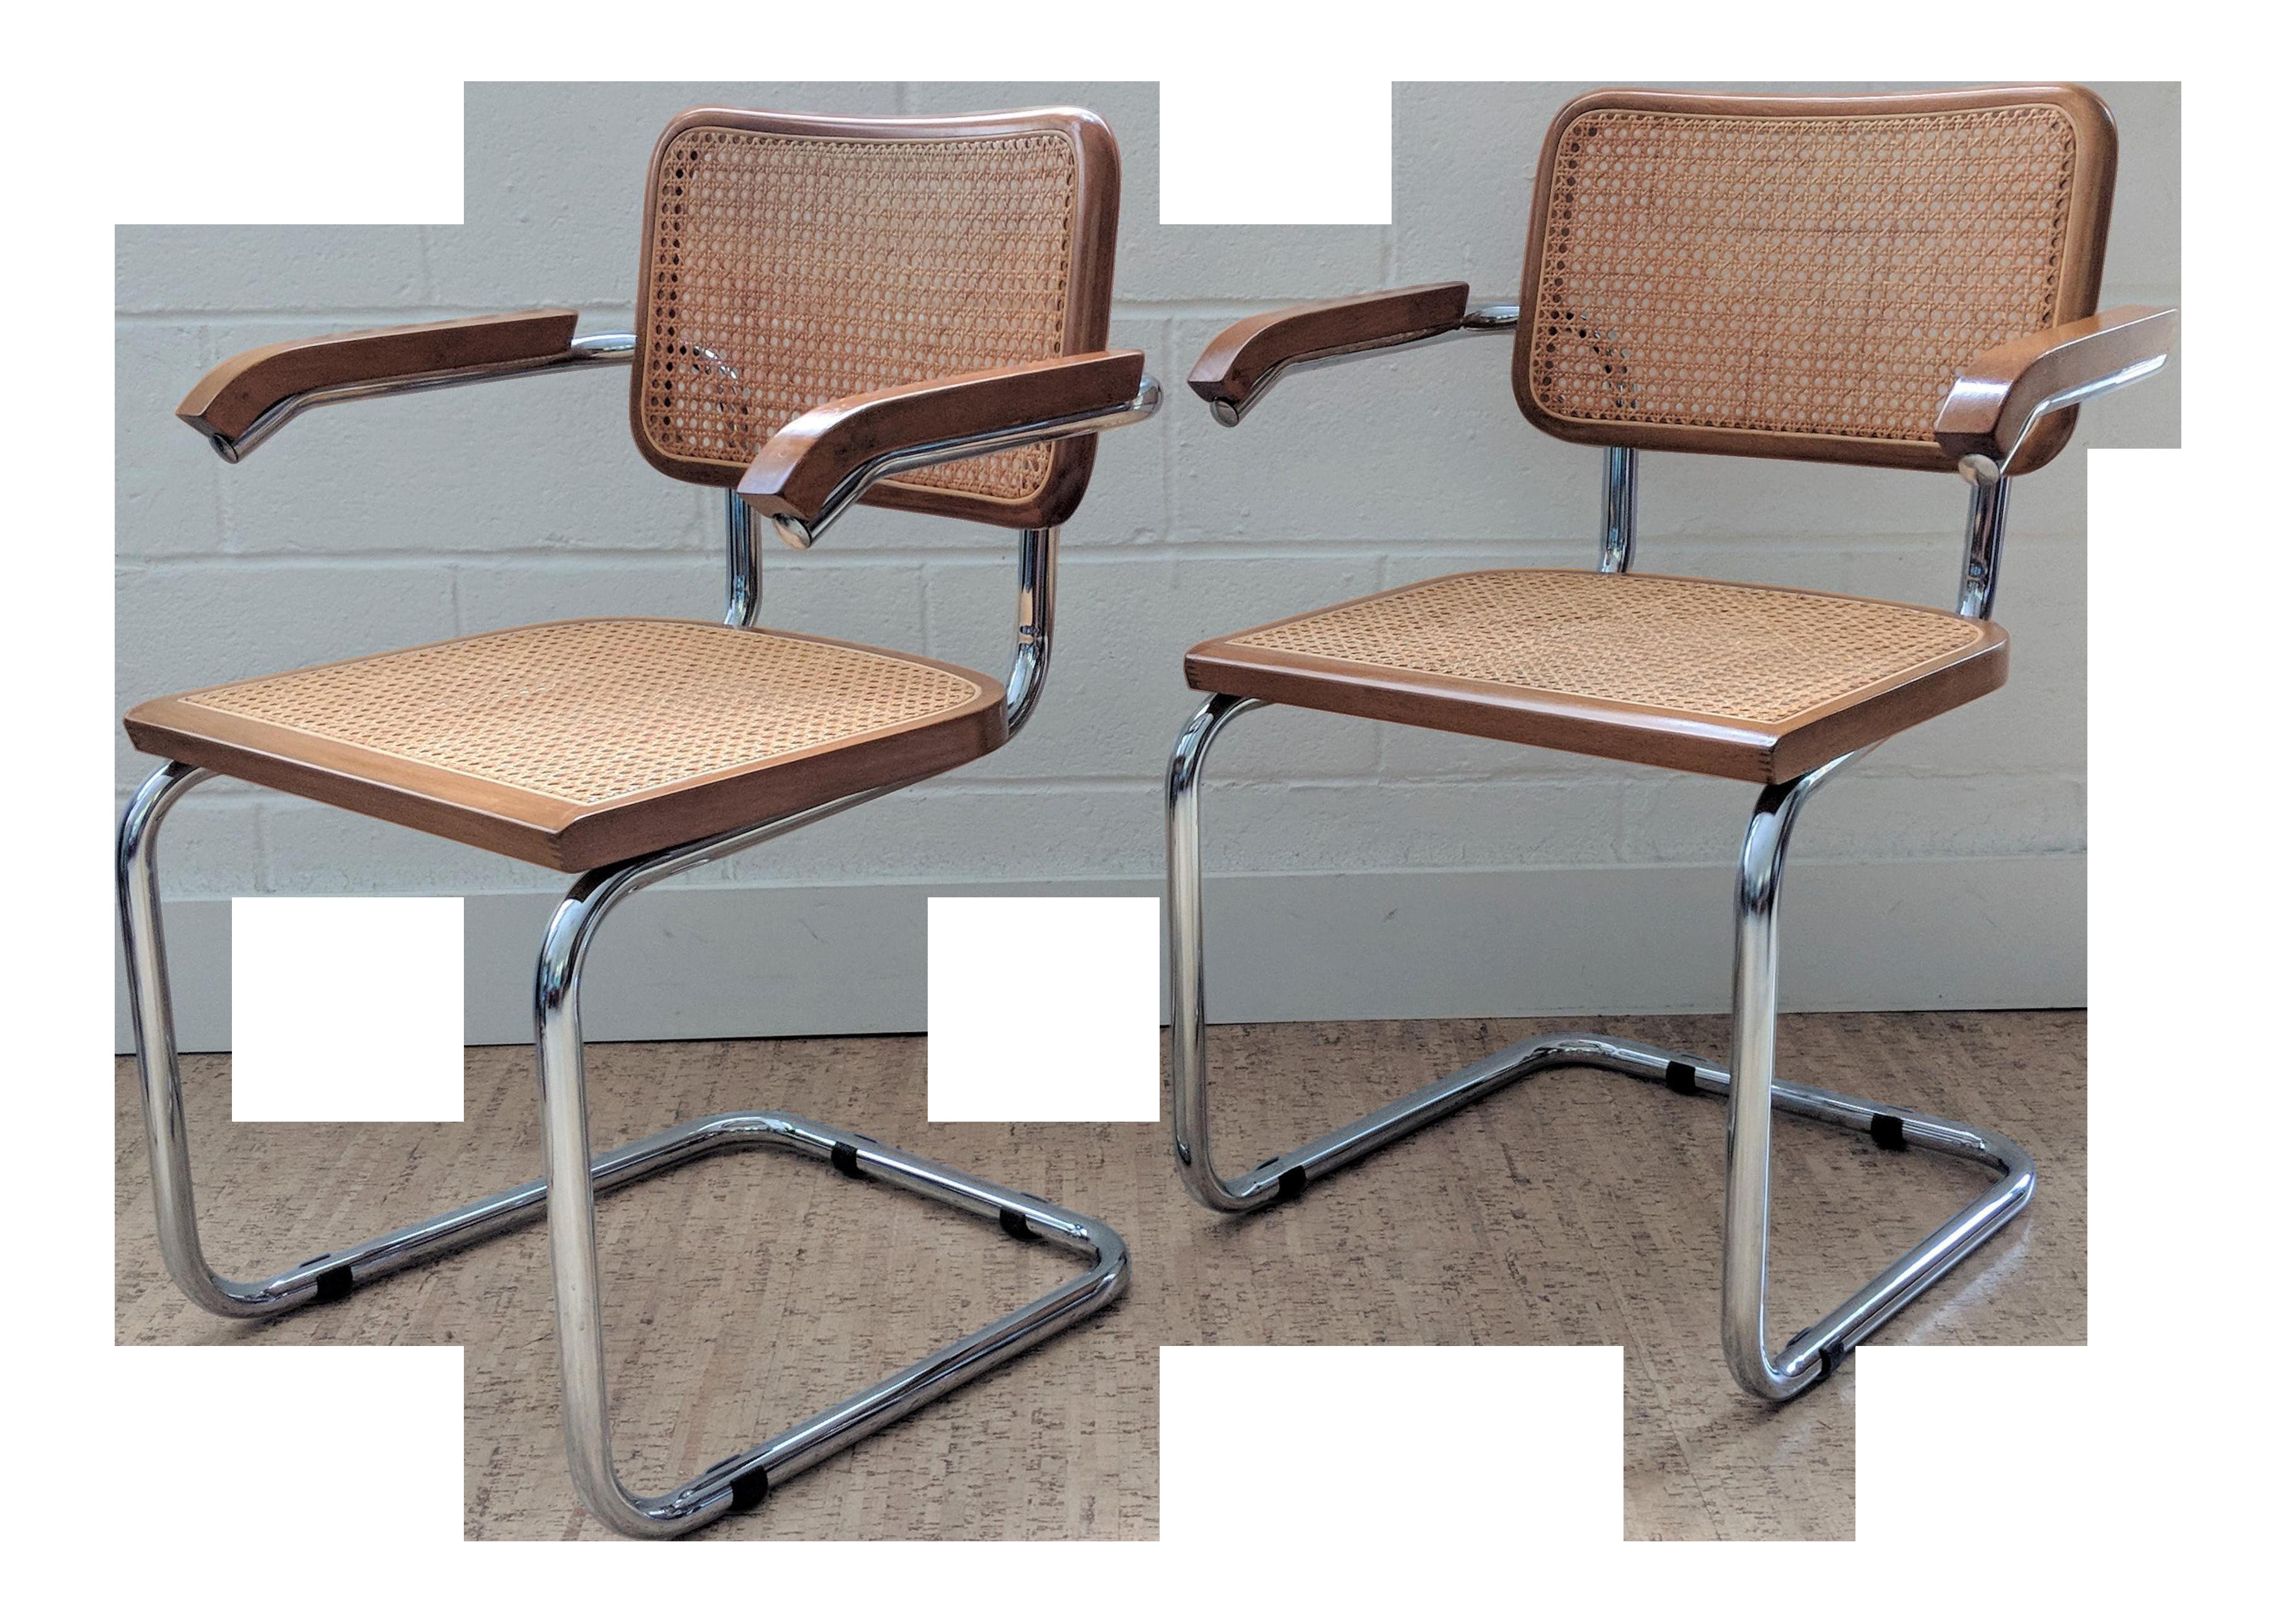 Marcel Breuer Cesca Style Chairs   A Pair